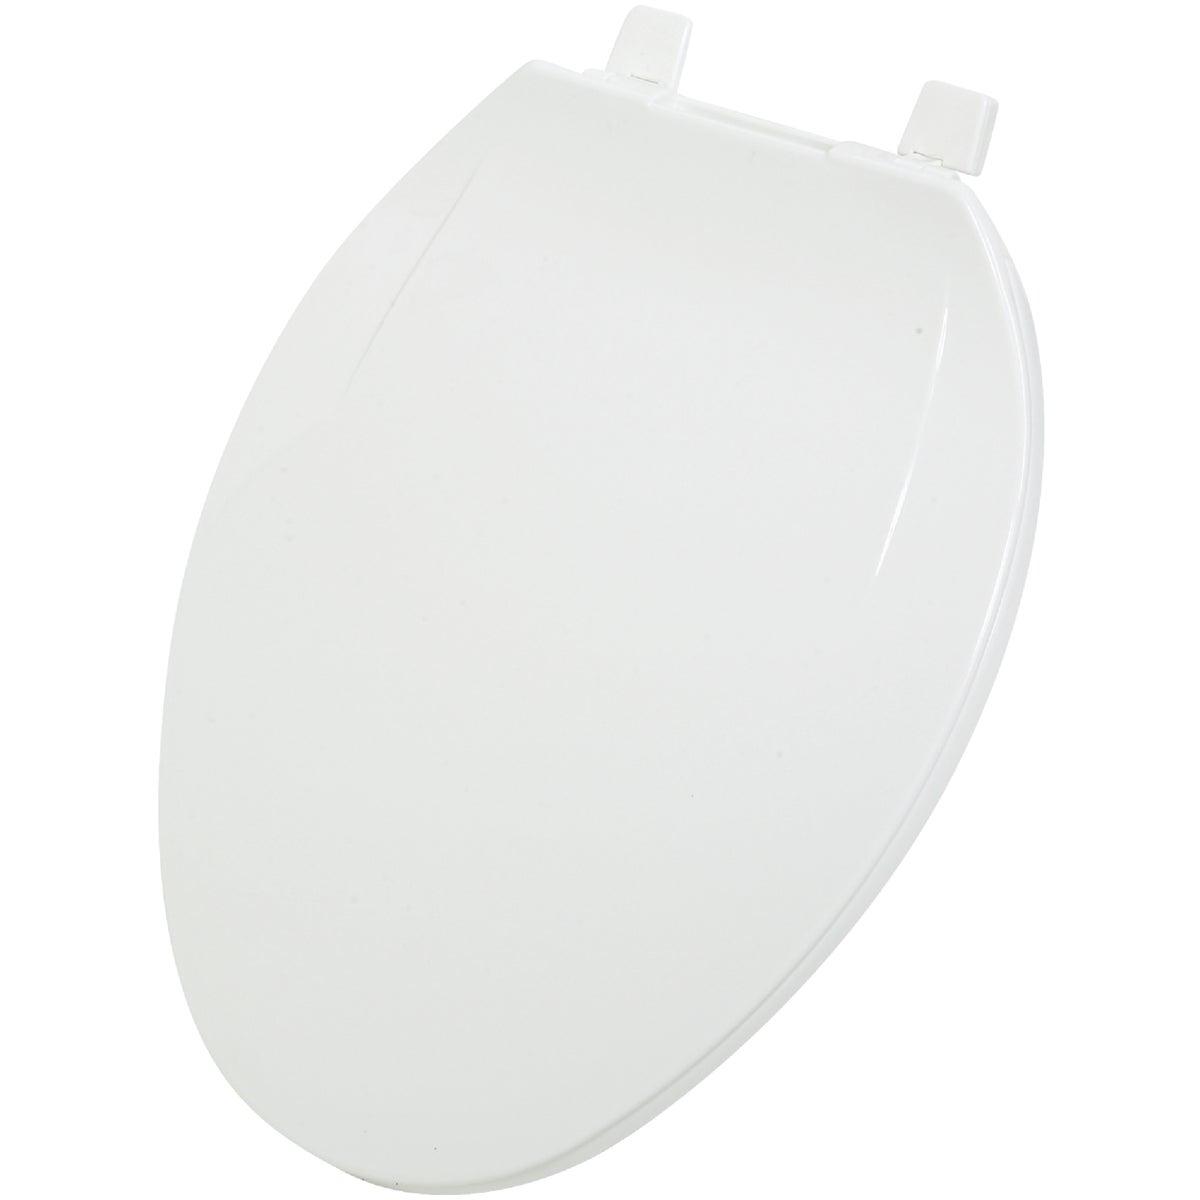 Do it Best Imports WHITE ELONG PLAS SEAT 445441